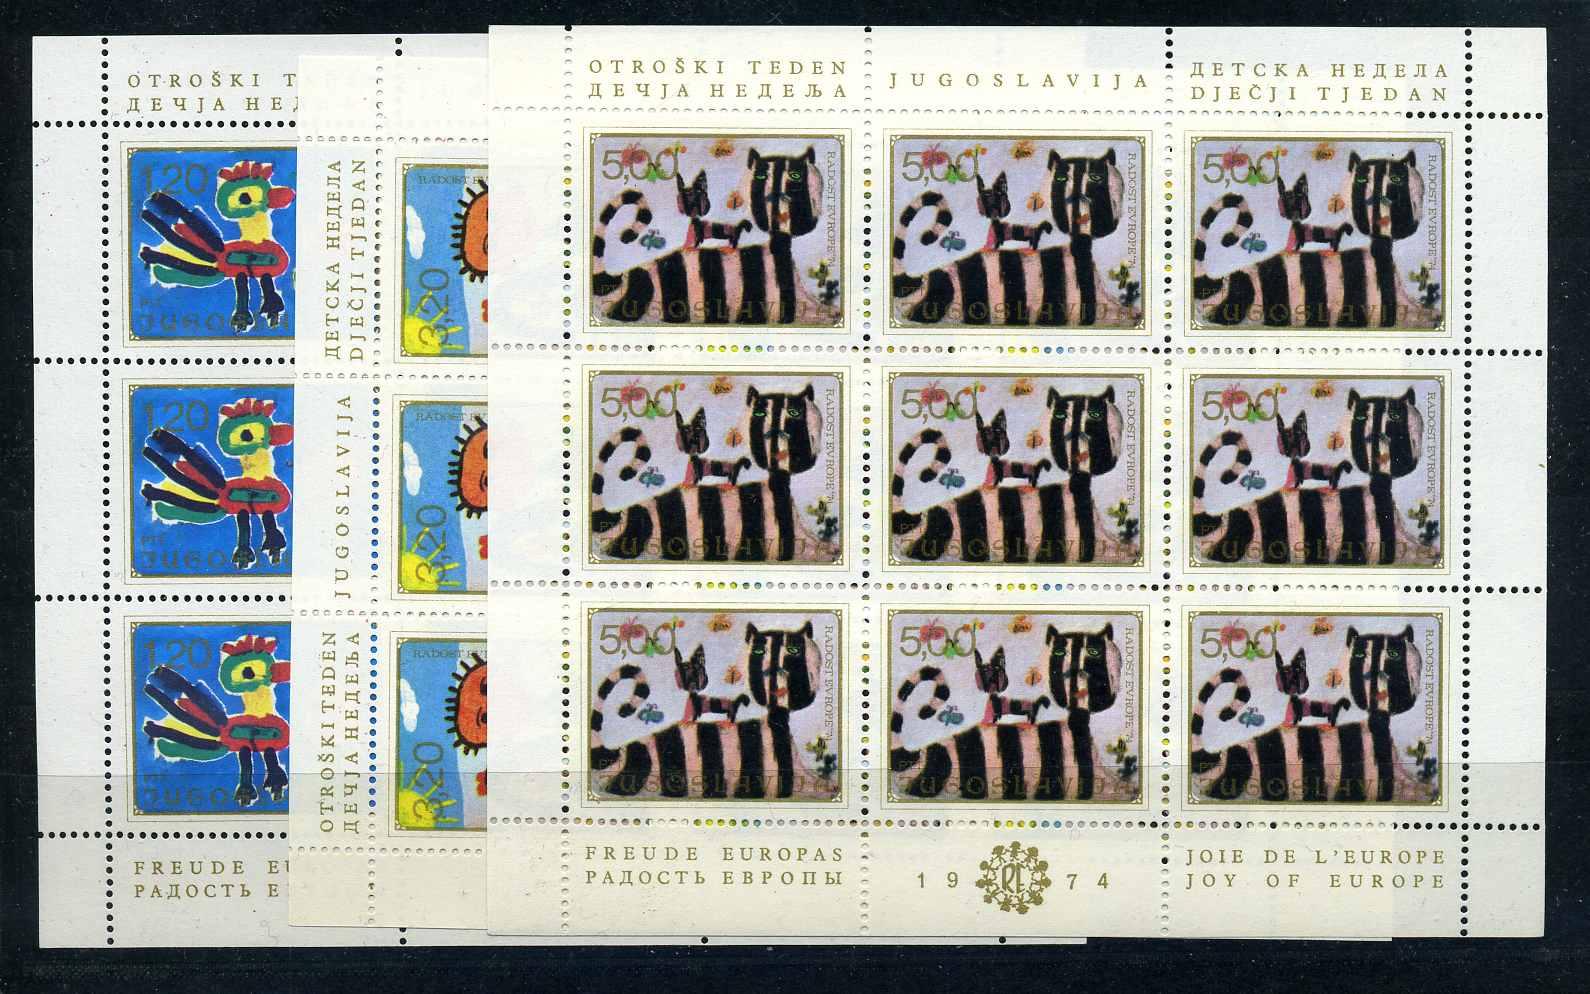 Europa Briefmarken 105101 Jugoslawien 1960 Nr 909-916 Gestempelt